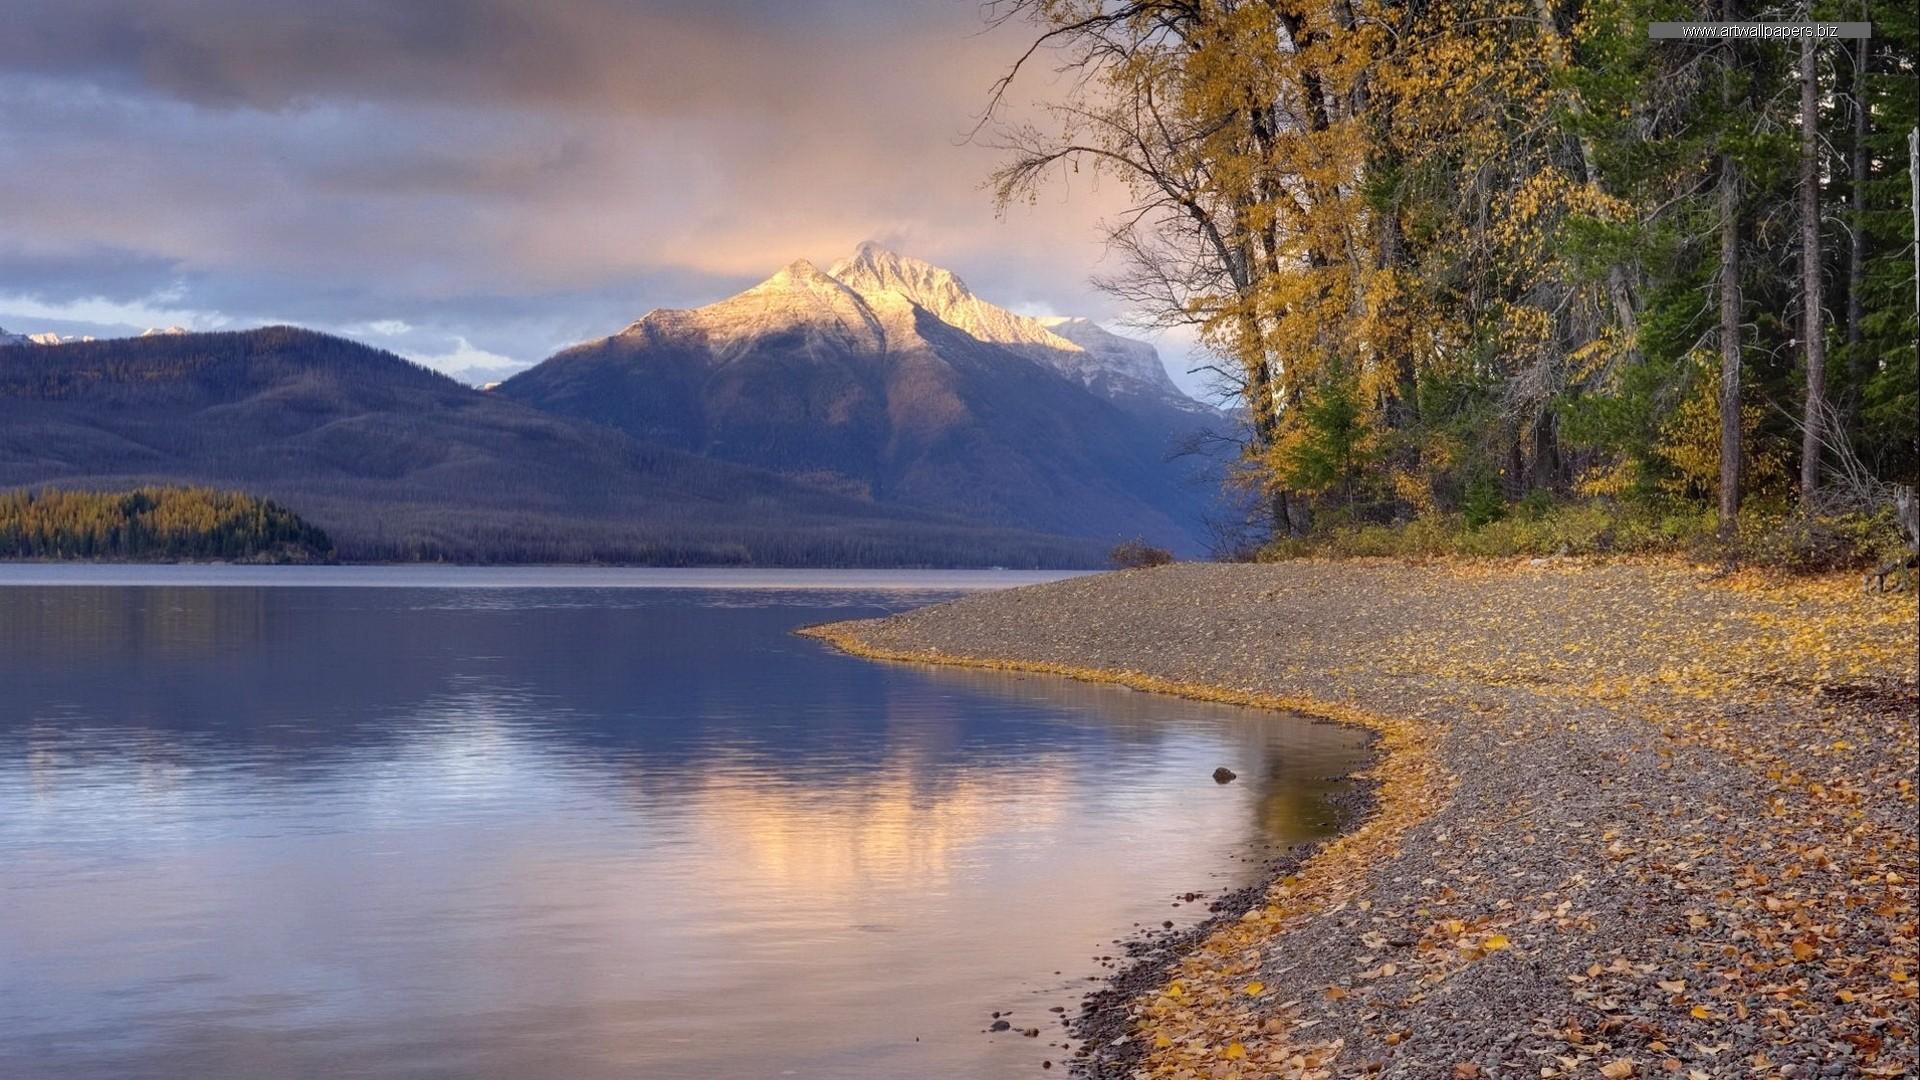 Nature Full HD Wallpapers 1080p, Desktop Backgounds, Nature Wallpaper